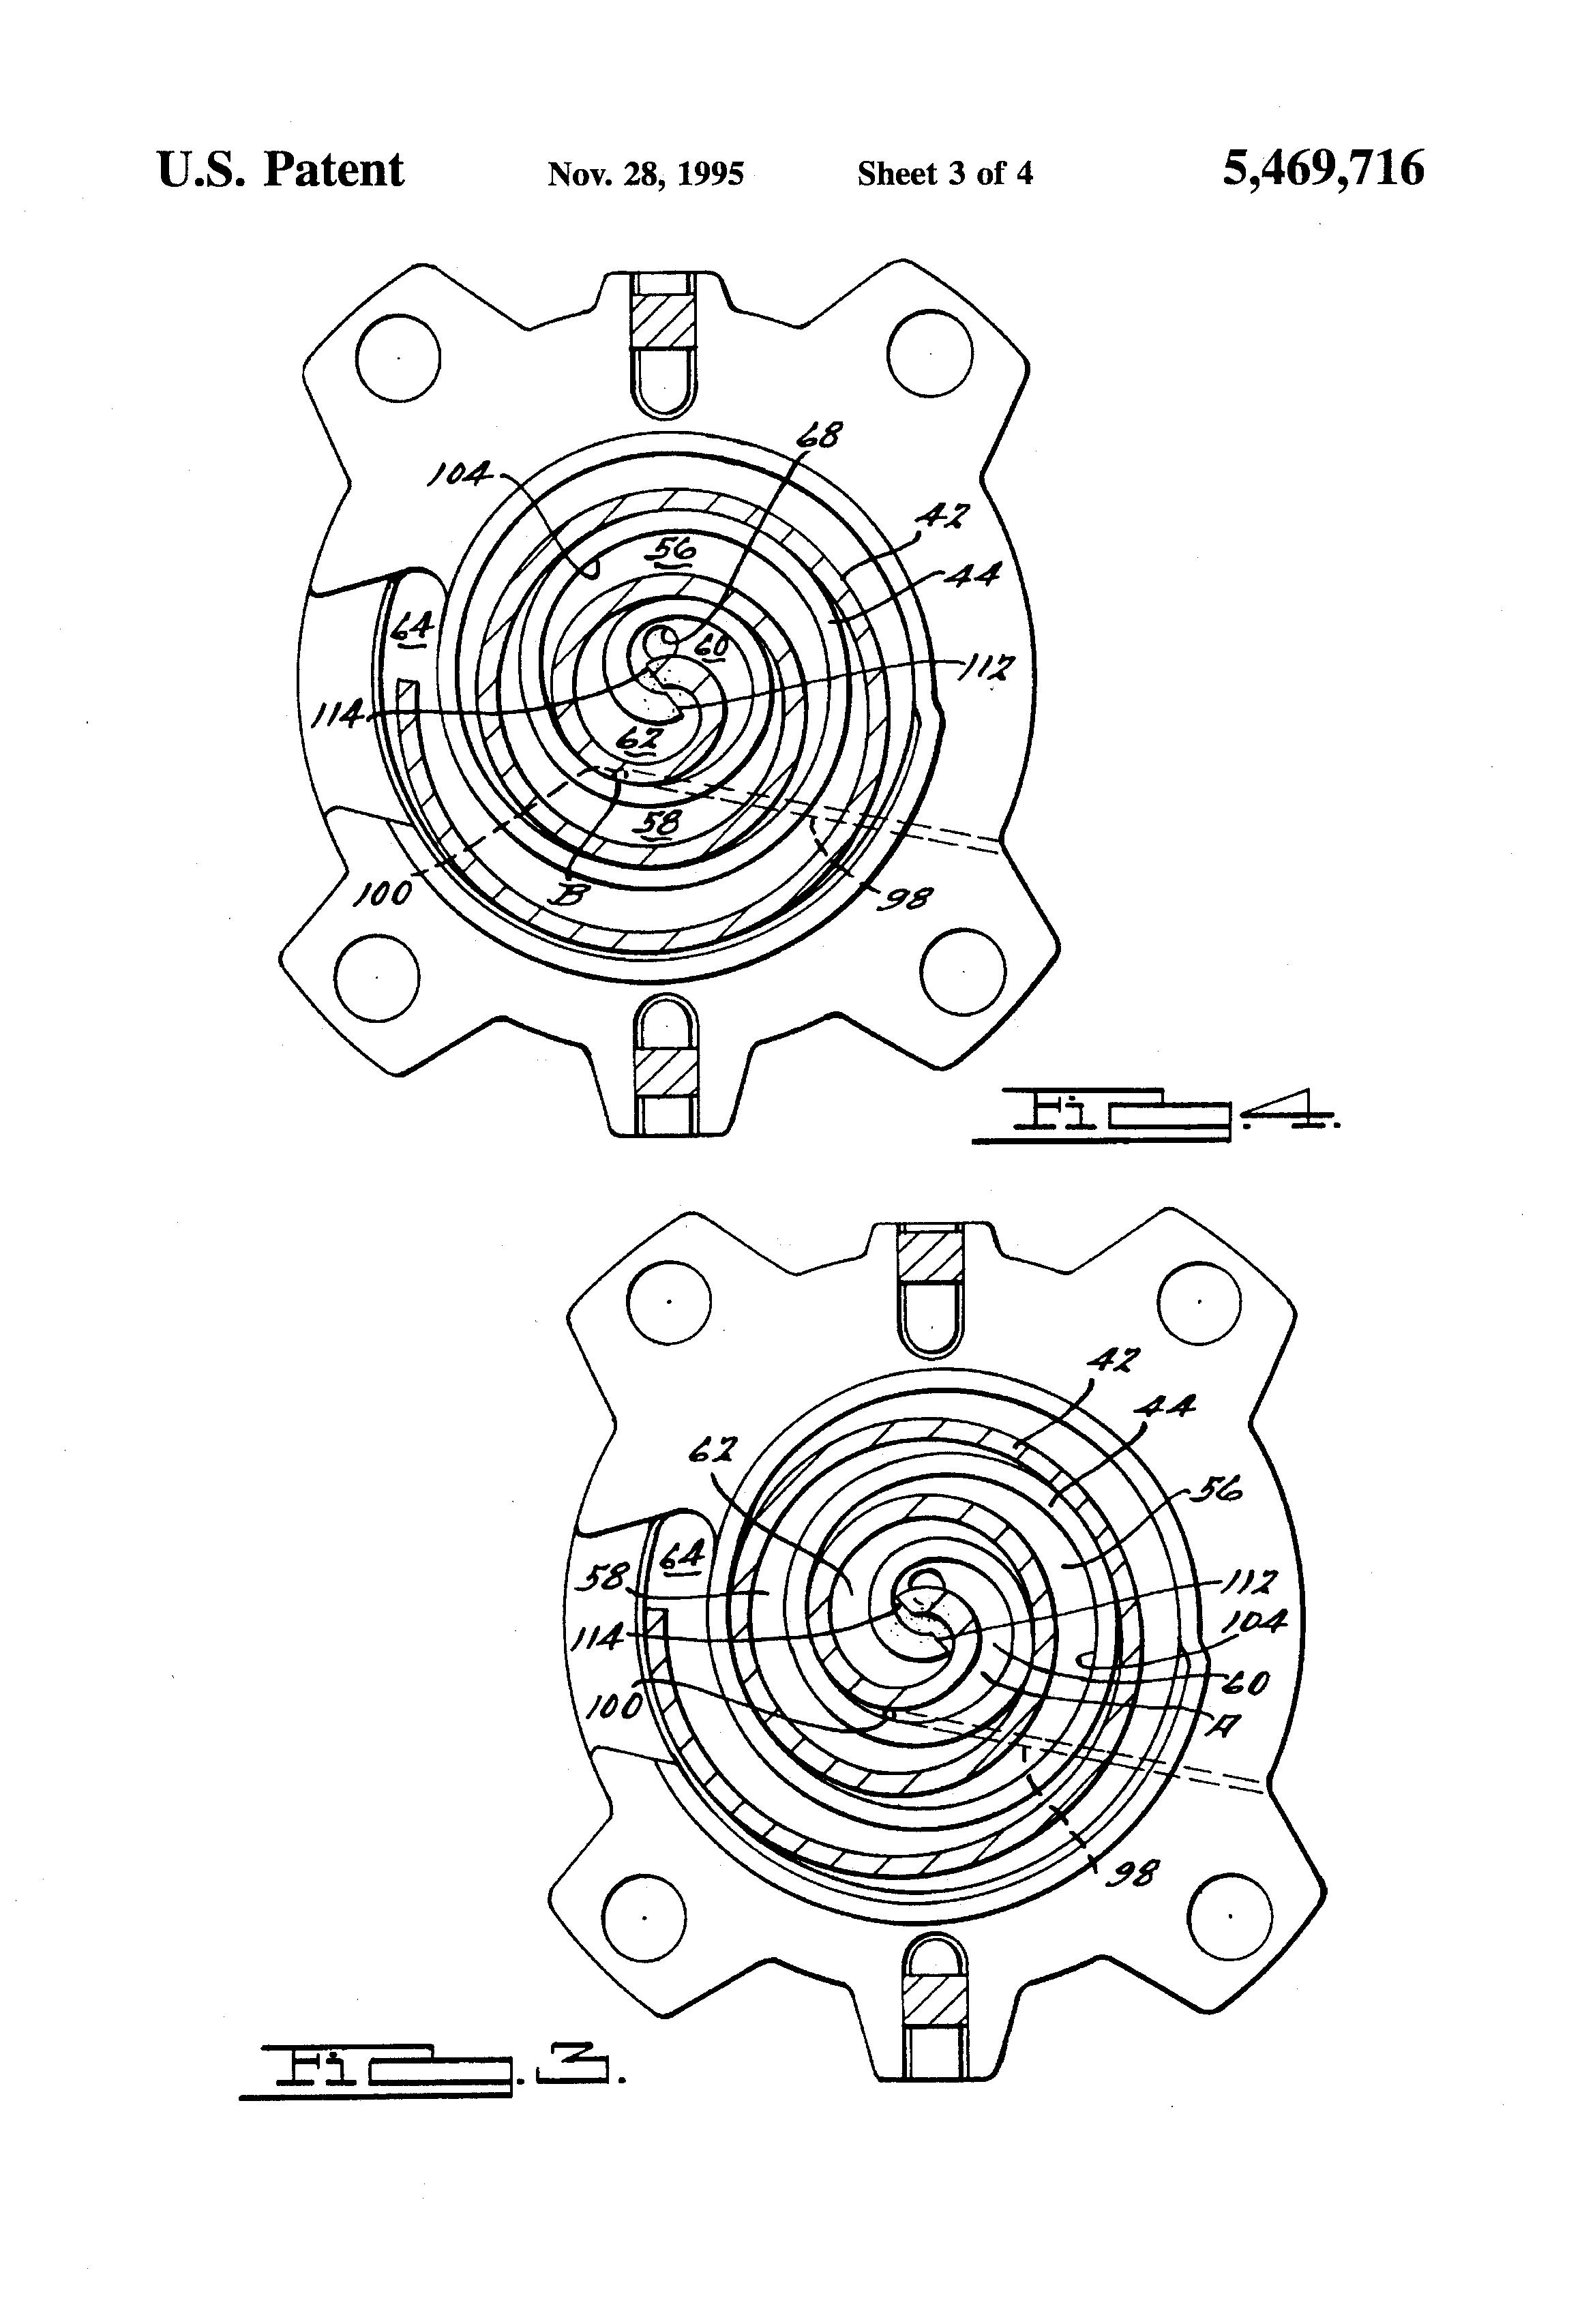 B796 Wiring Diagram 98 Buick Lesabre Wiring Resources